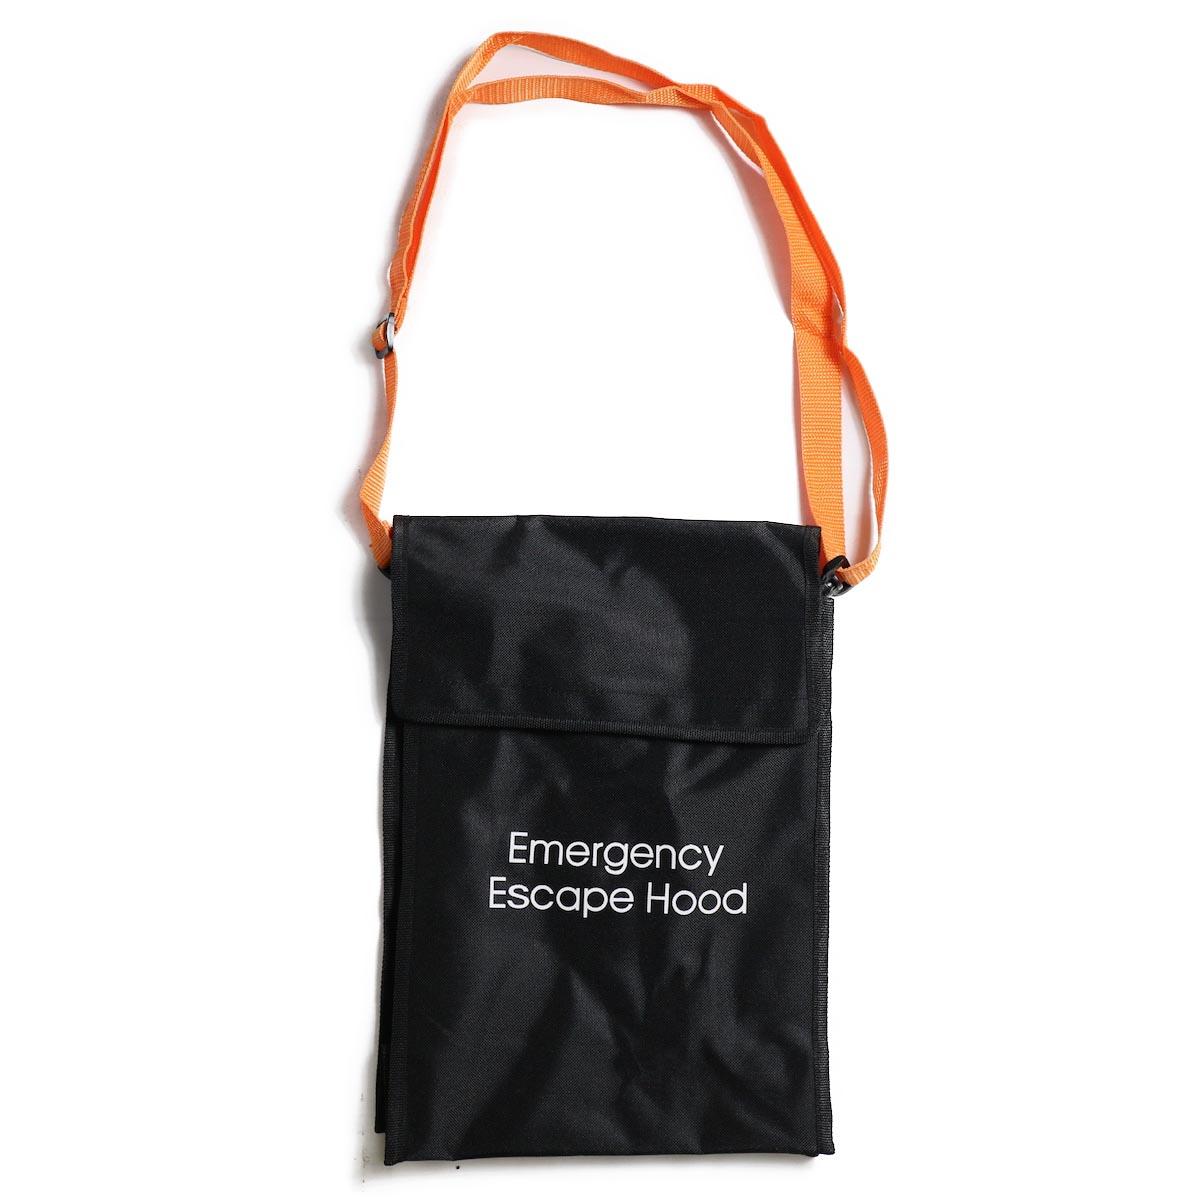 DEAD STOCK / US G.I EMERGENCY ESCAPE HOOD BAG